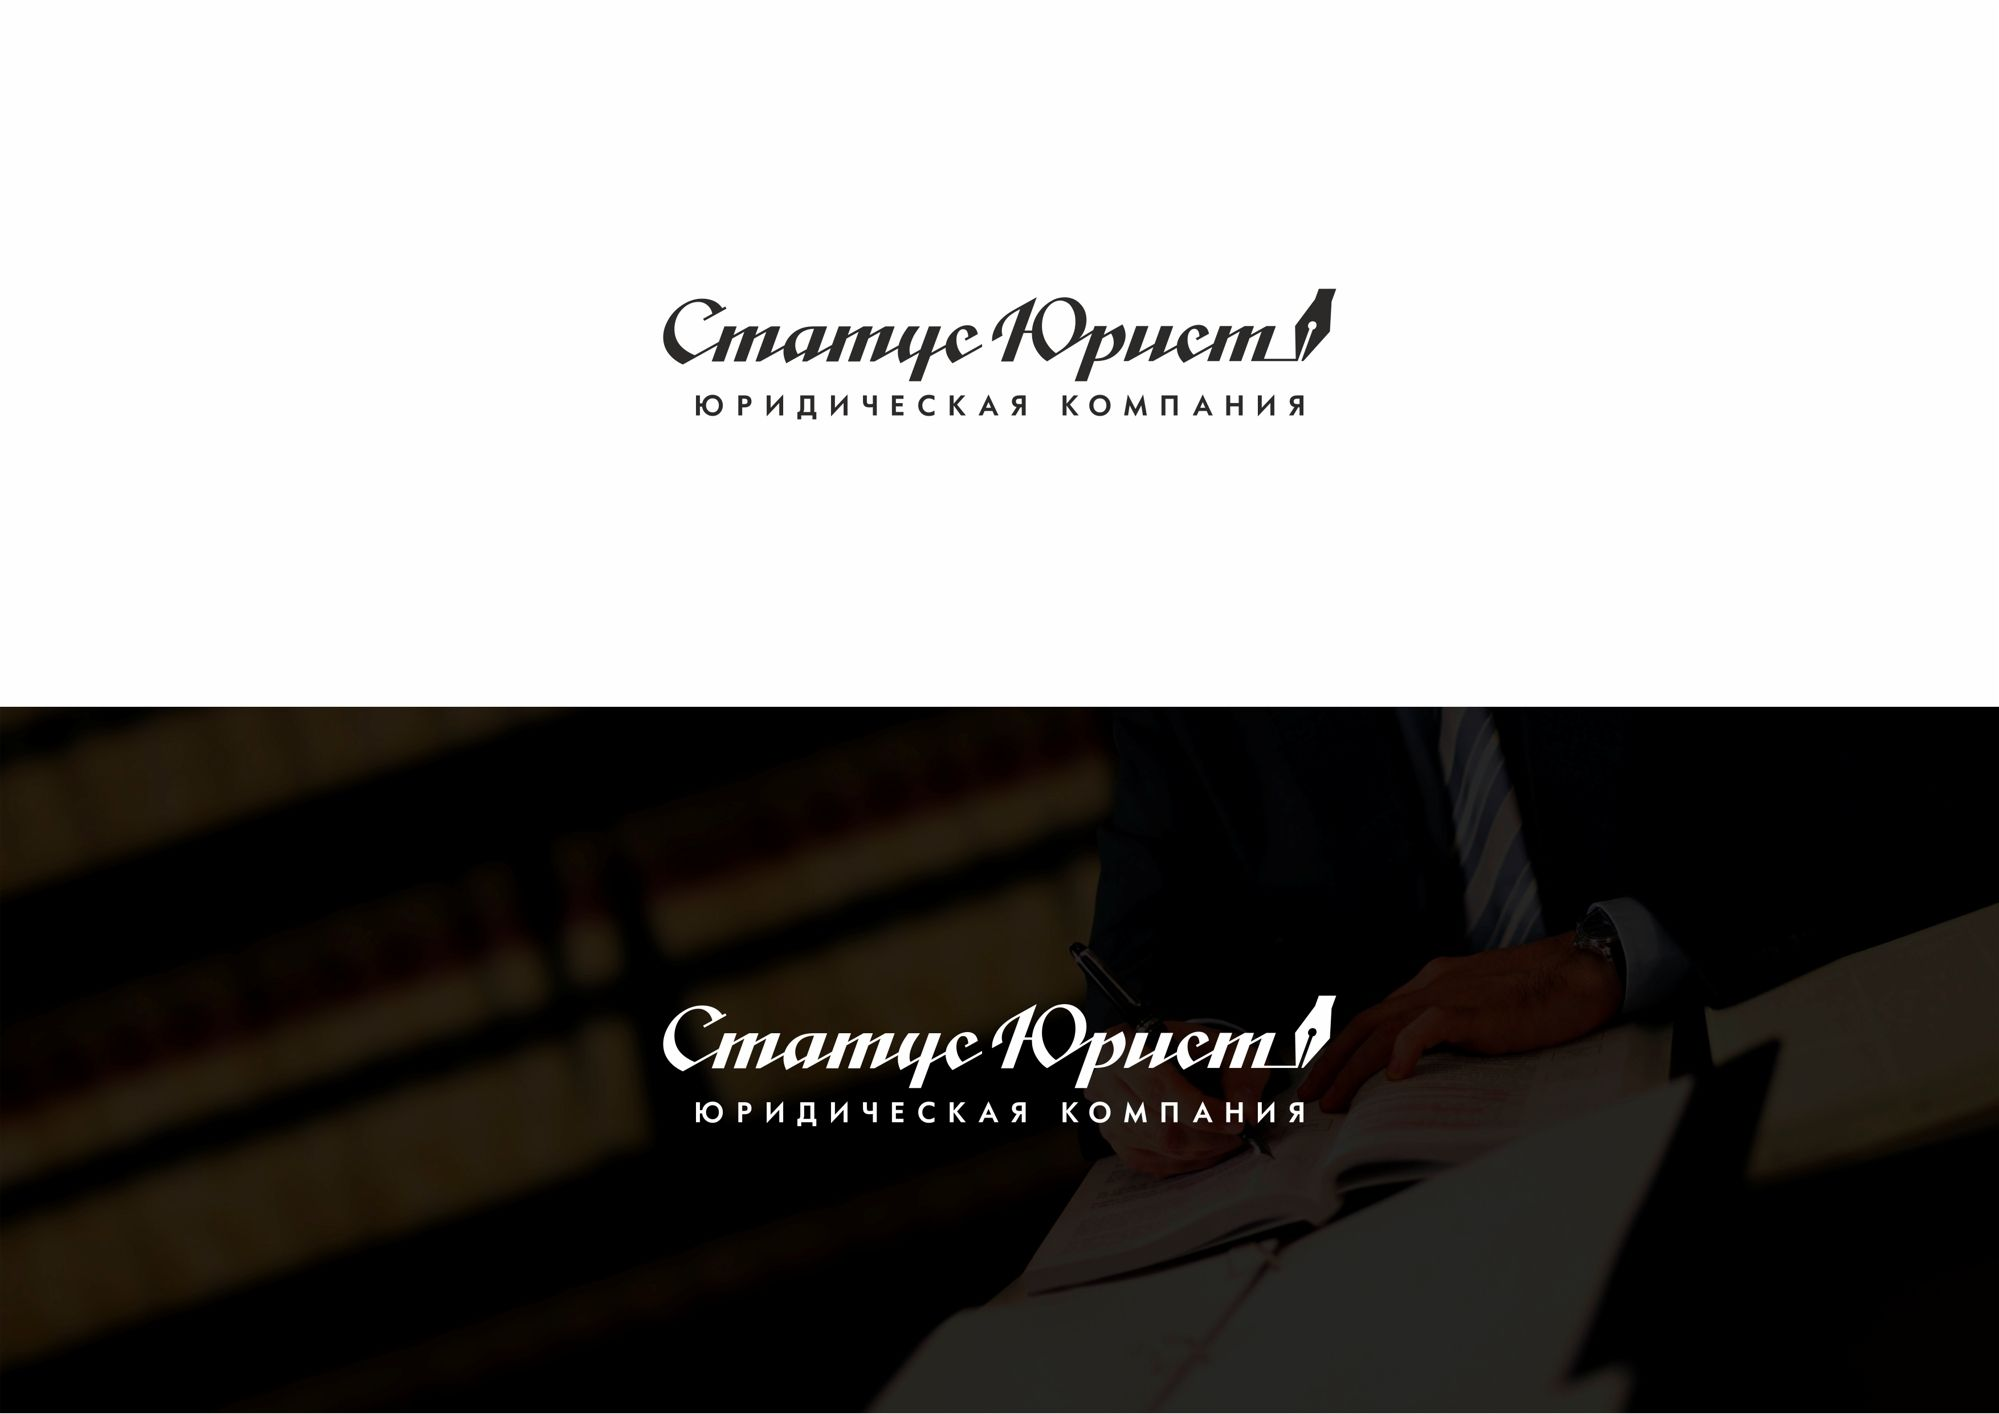 Логотип для Статус Юрист - дизайнер rowan